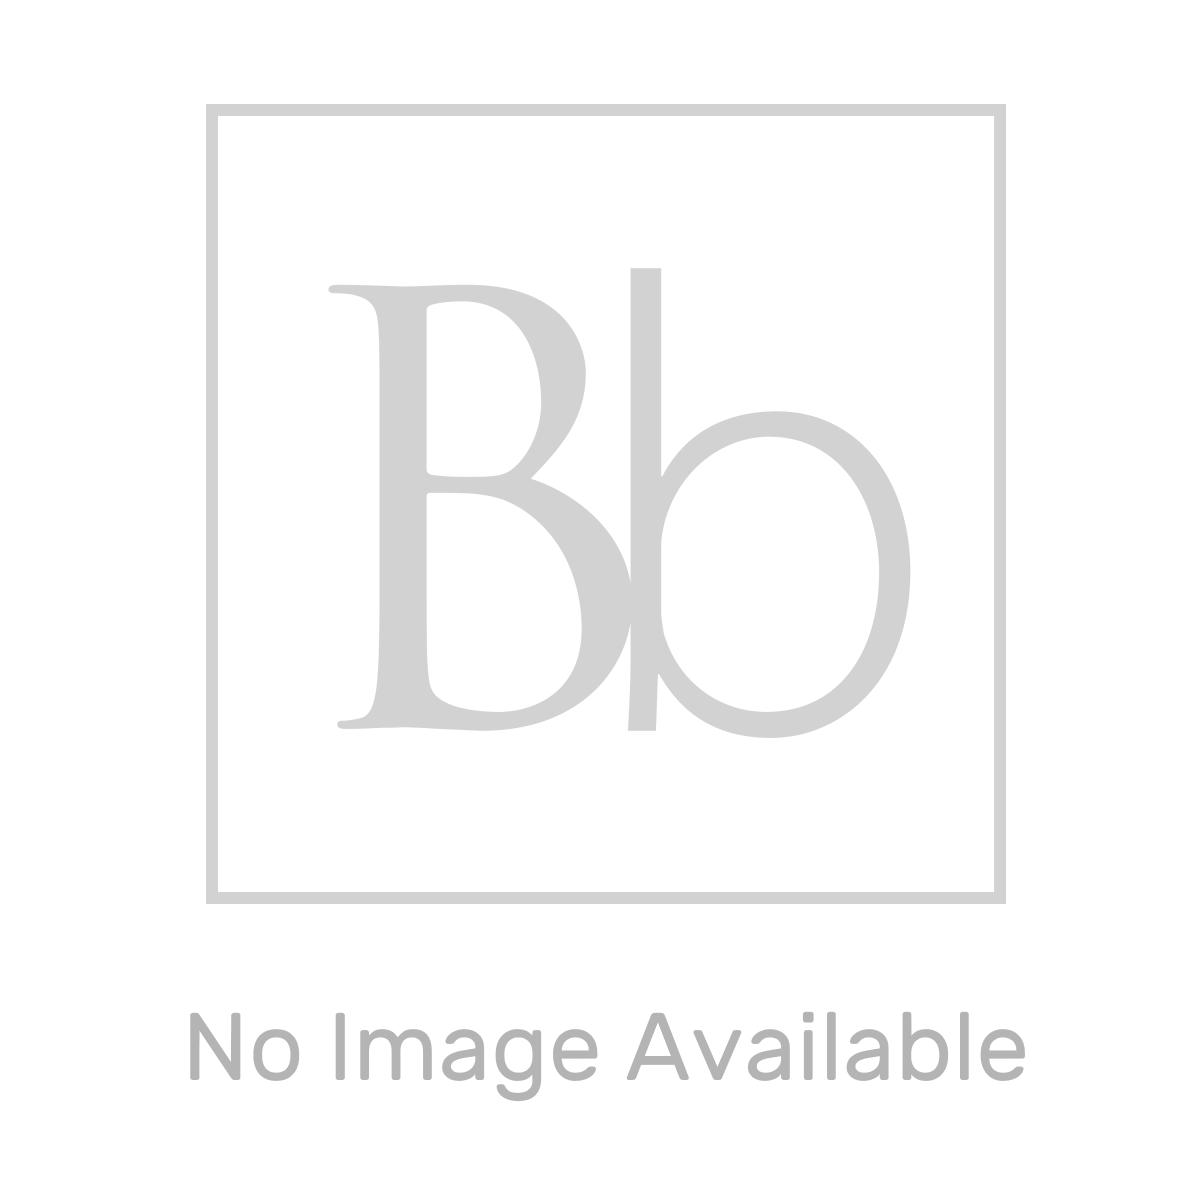 Vitra Serenada Back to Wall Toilet